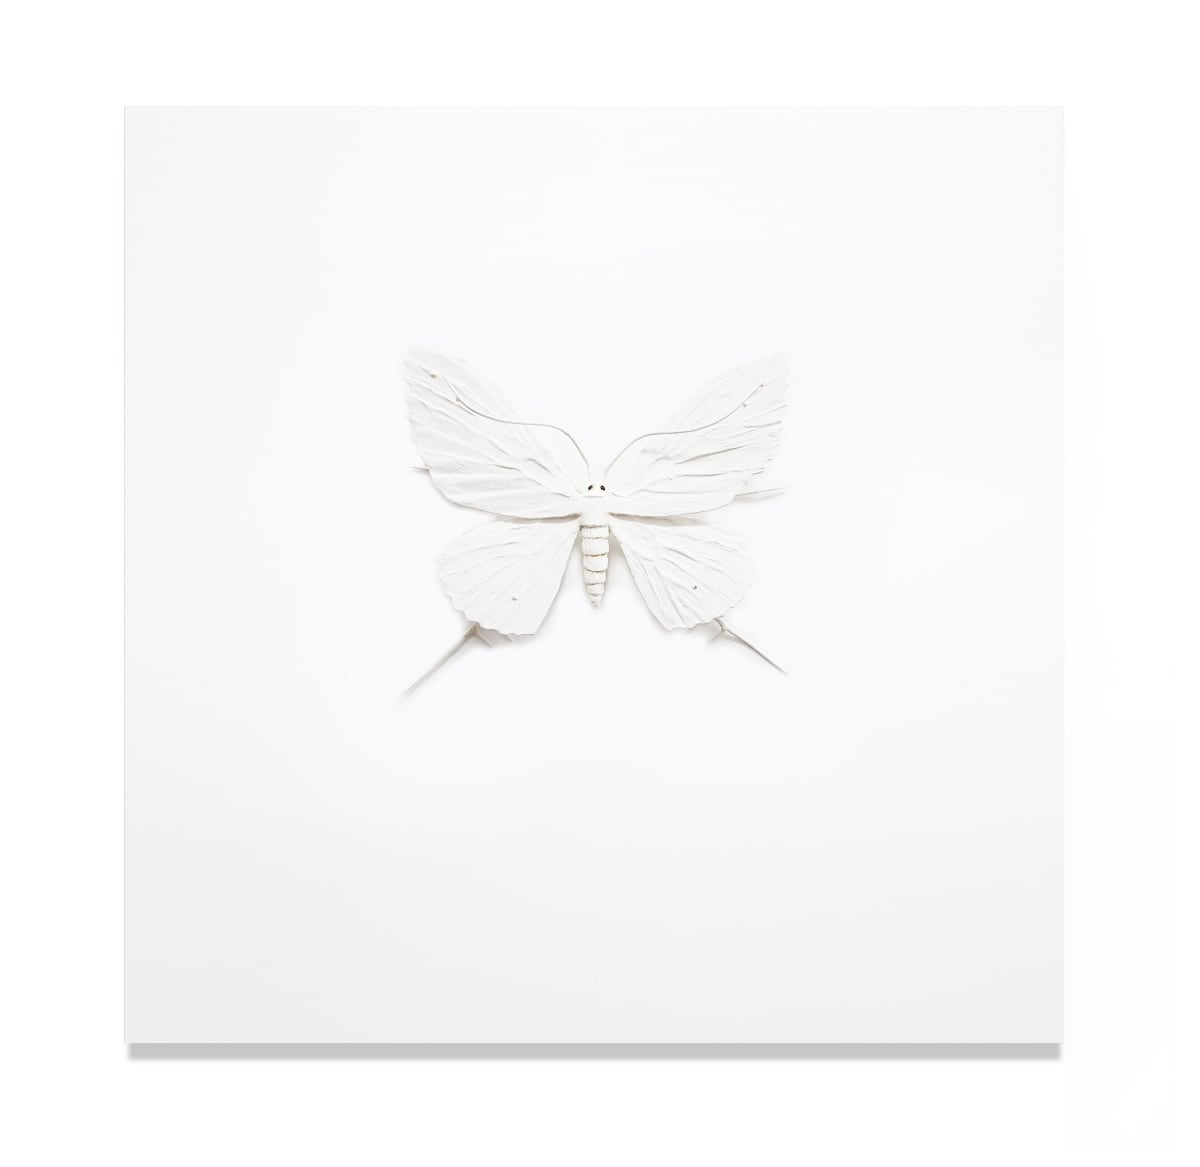 Elizabeth THOMSON The Black-and-Whites (White Mounted), 2017 Mixed media 17.7 x 17.7 in 45 x 45 cm